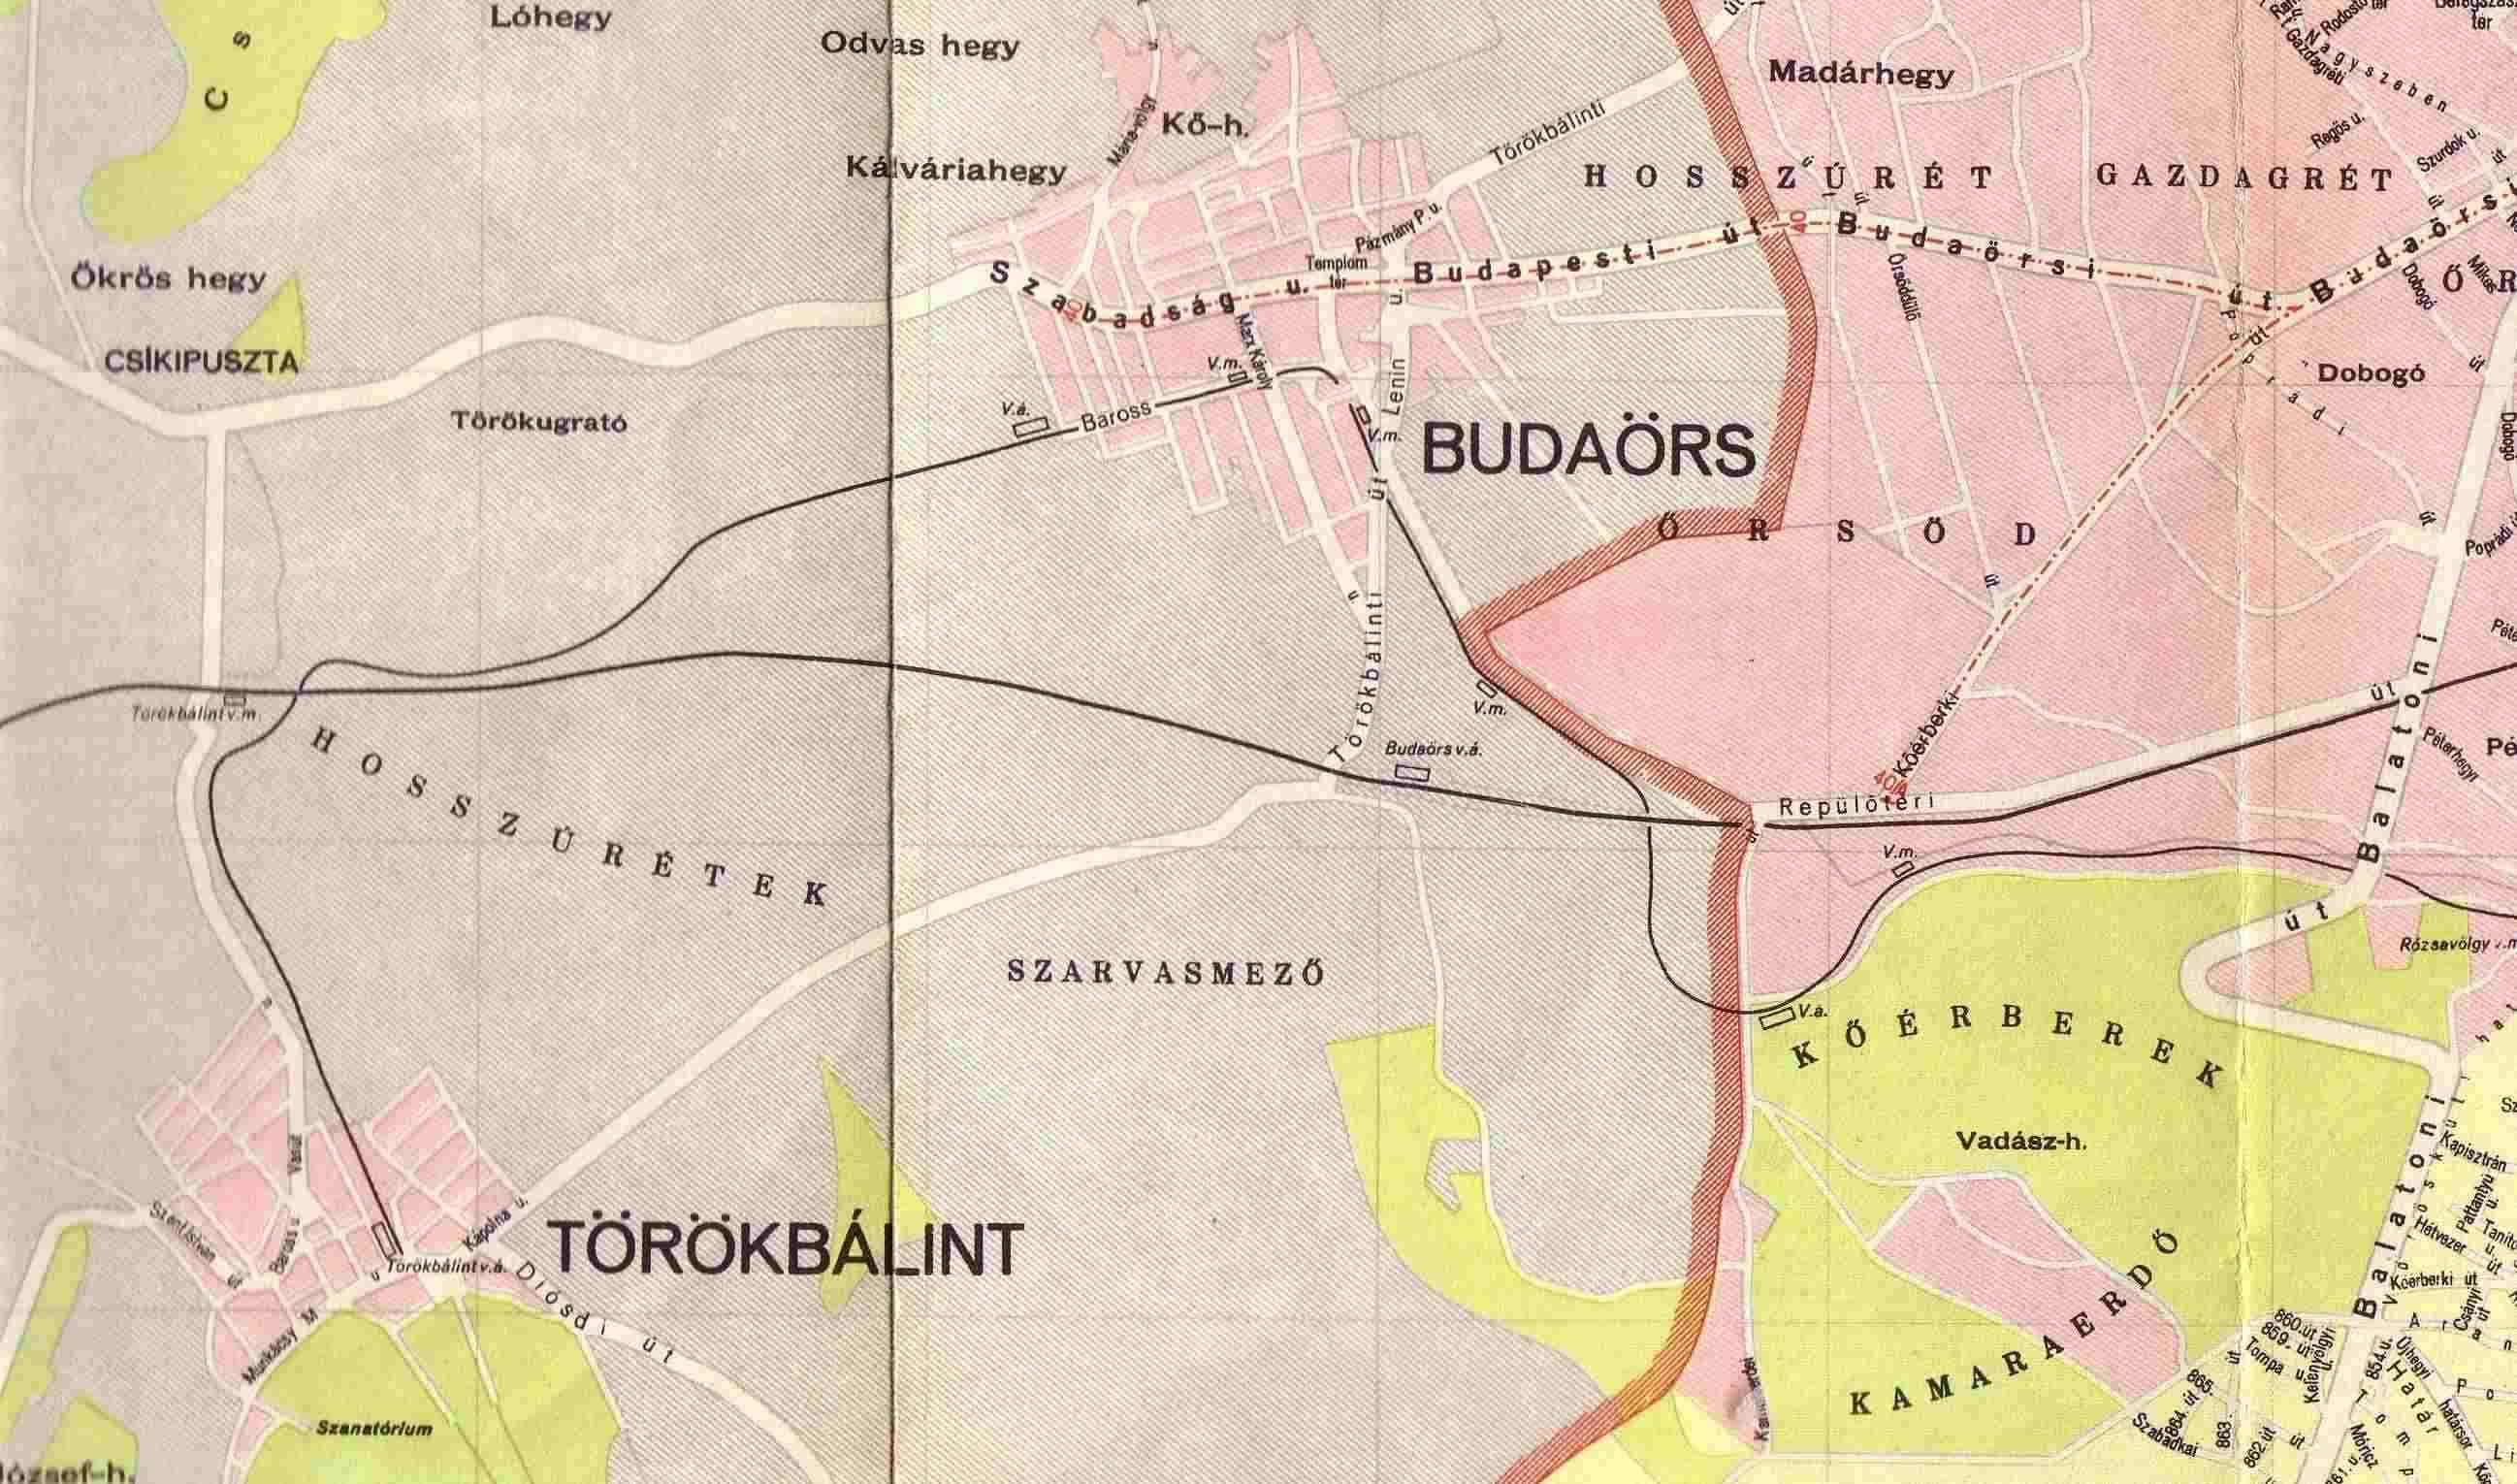 törökbálint térkép Villamossal Budaörsre   HamPLÓ törökbálint térkép